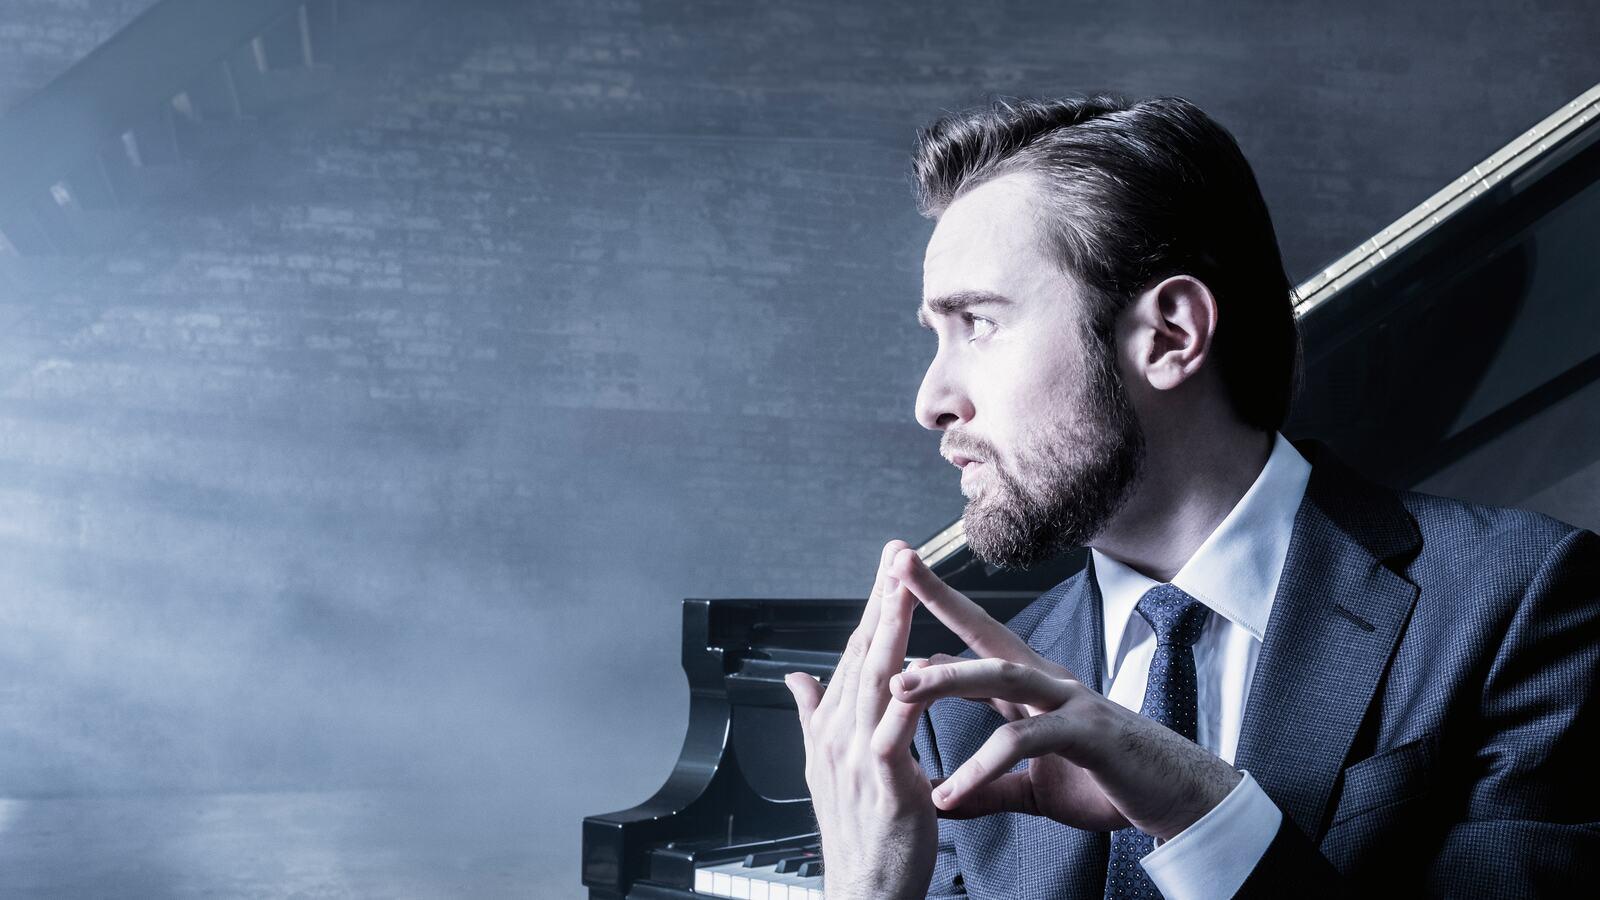 Daniil Trifonov, pianist